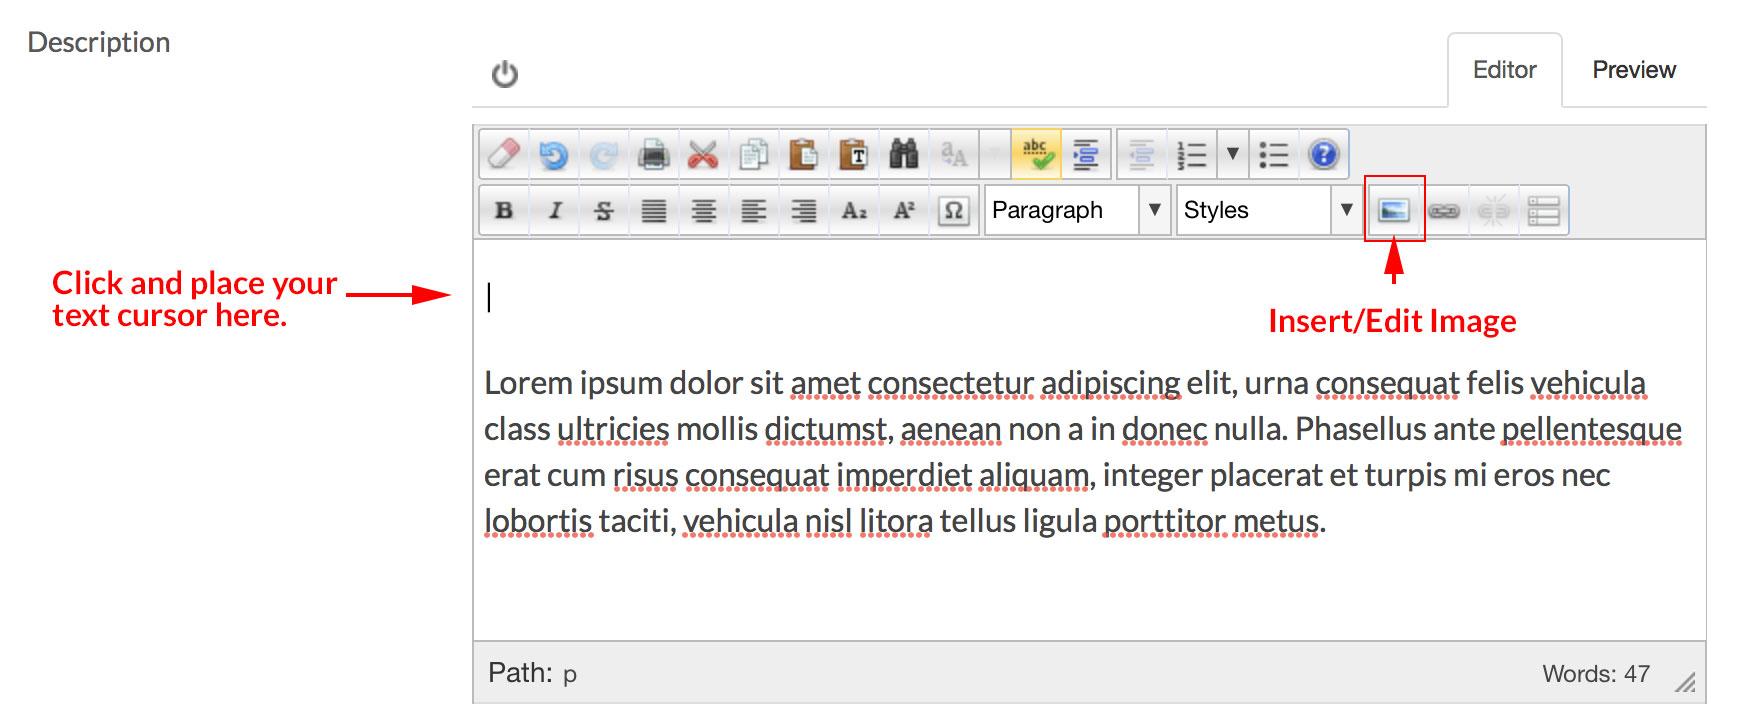 editor place cursor image icon